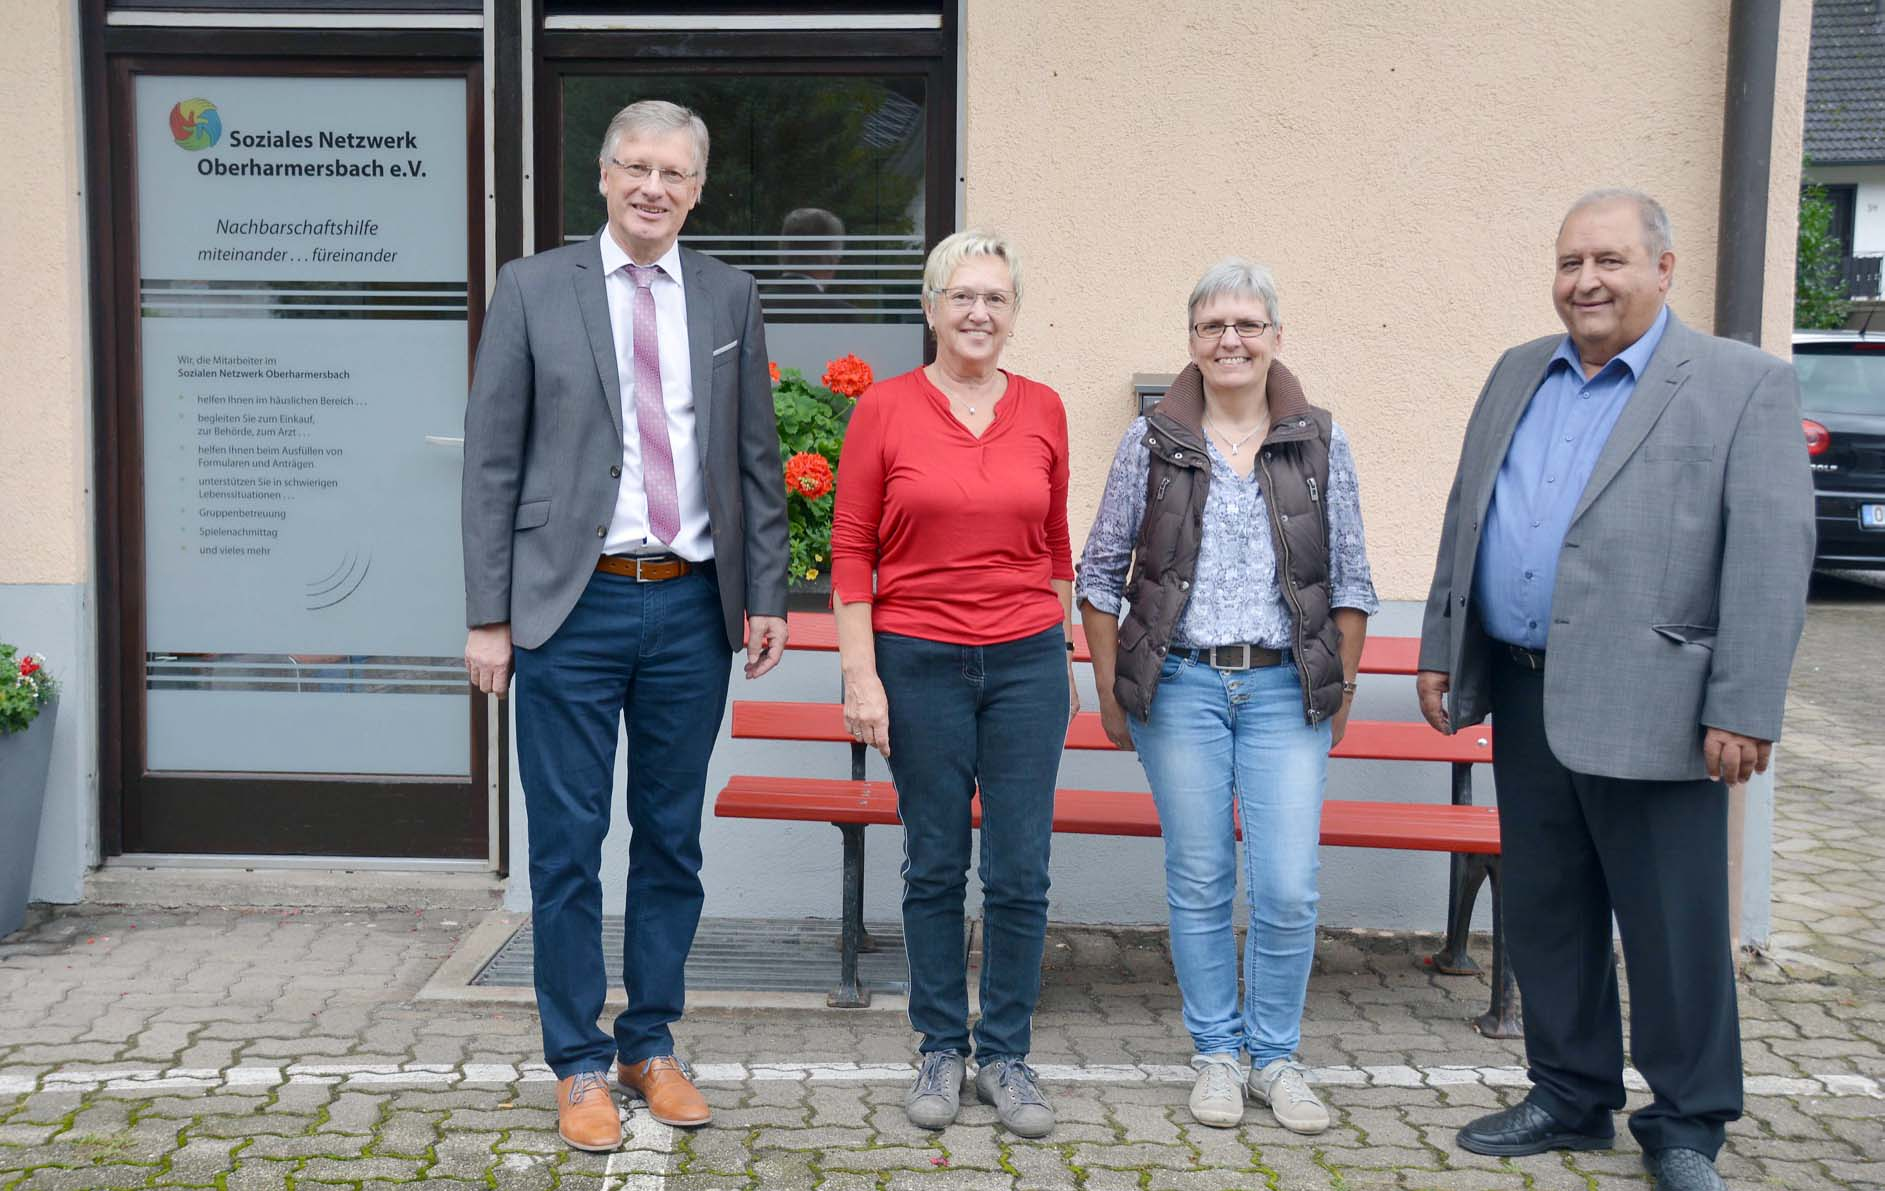 2021-9-17-ZE-OH-hps-Soziales Netzwerk Oberharmersbach-DSC_0676 2